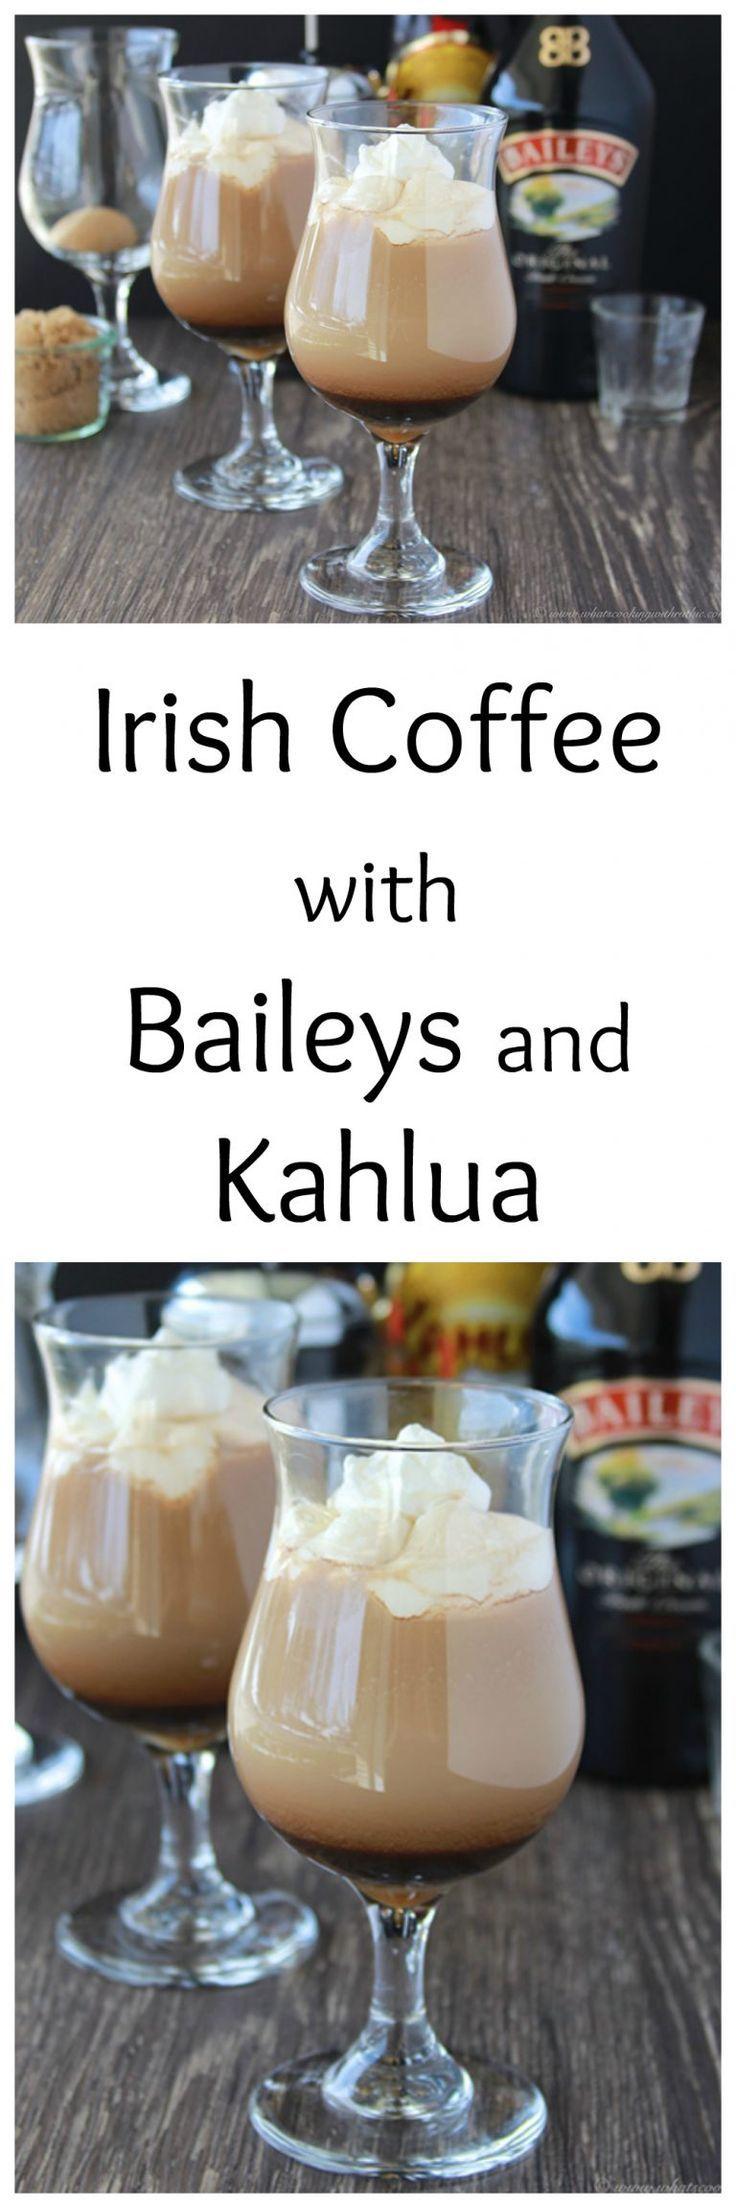 Irish Coffee with Baileys and Kahlua Recipe Baileys